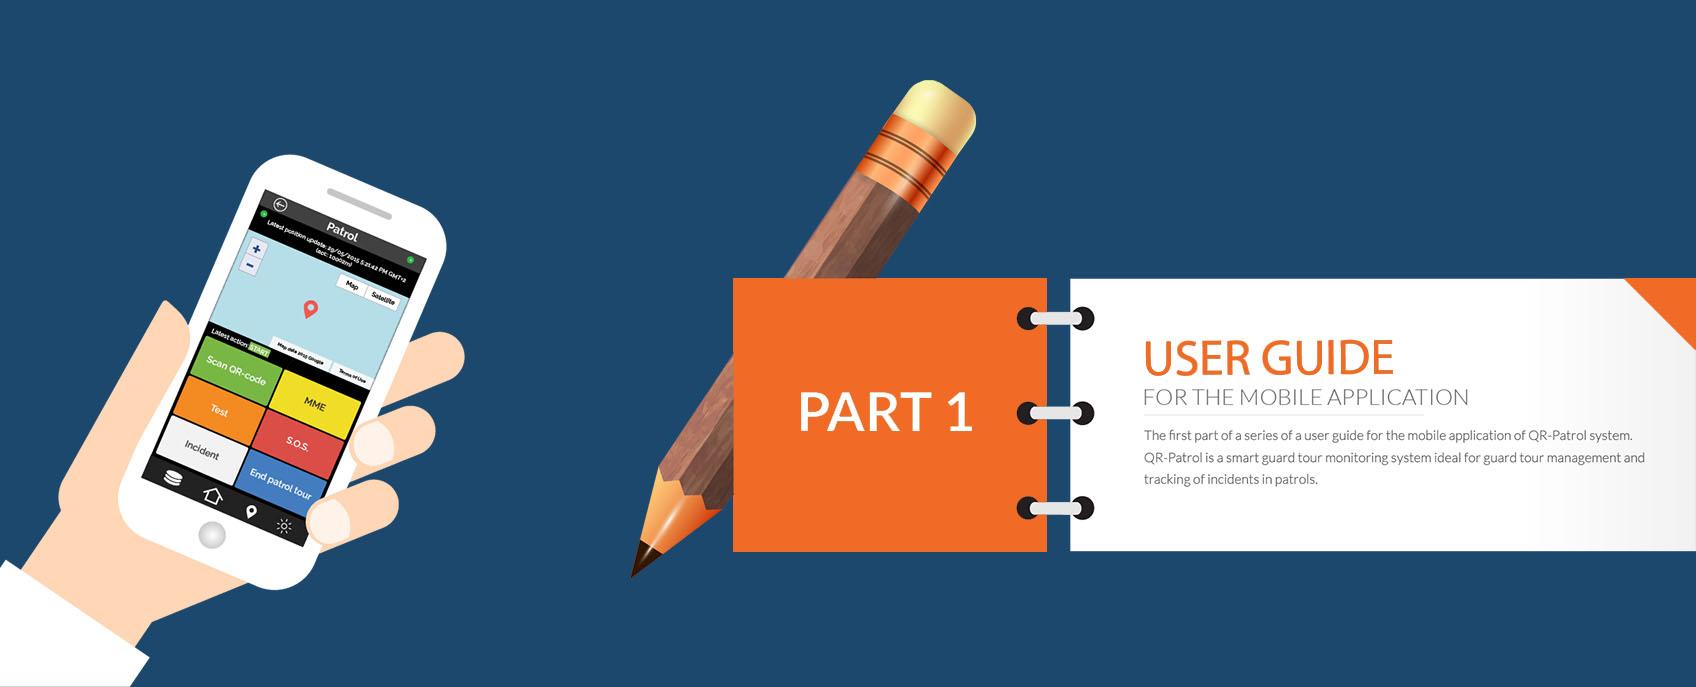 Getting into QR-Patrol mobile application - Part 1 | QR-Patrol